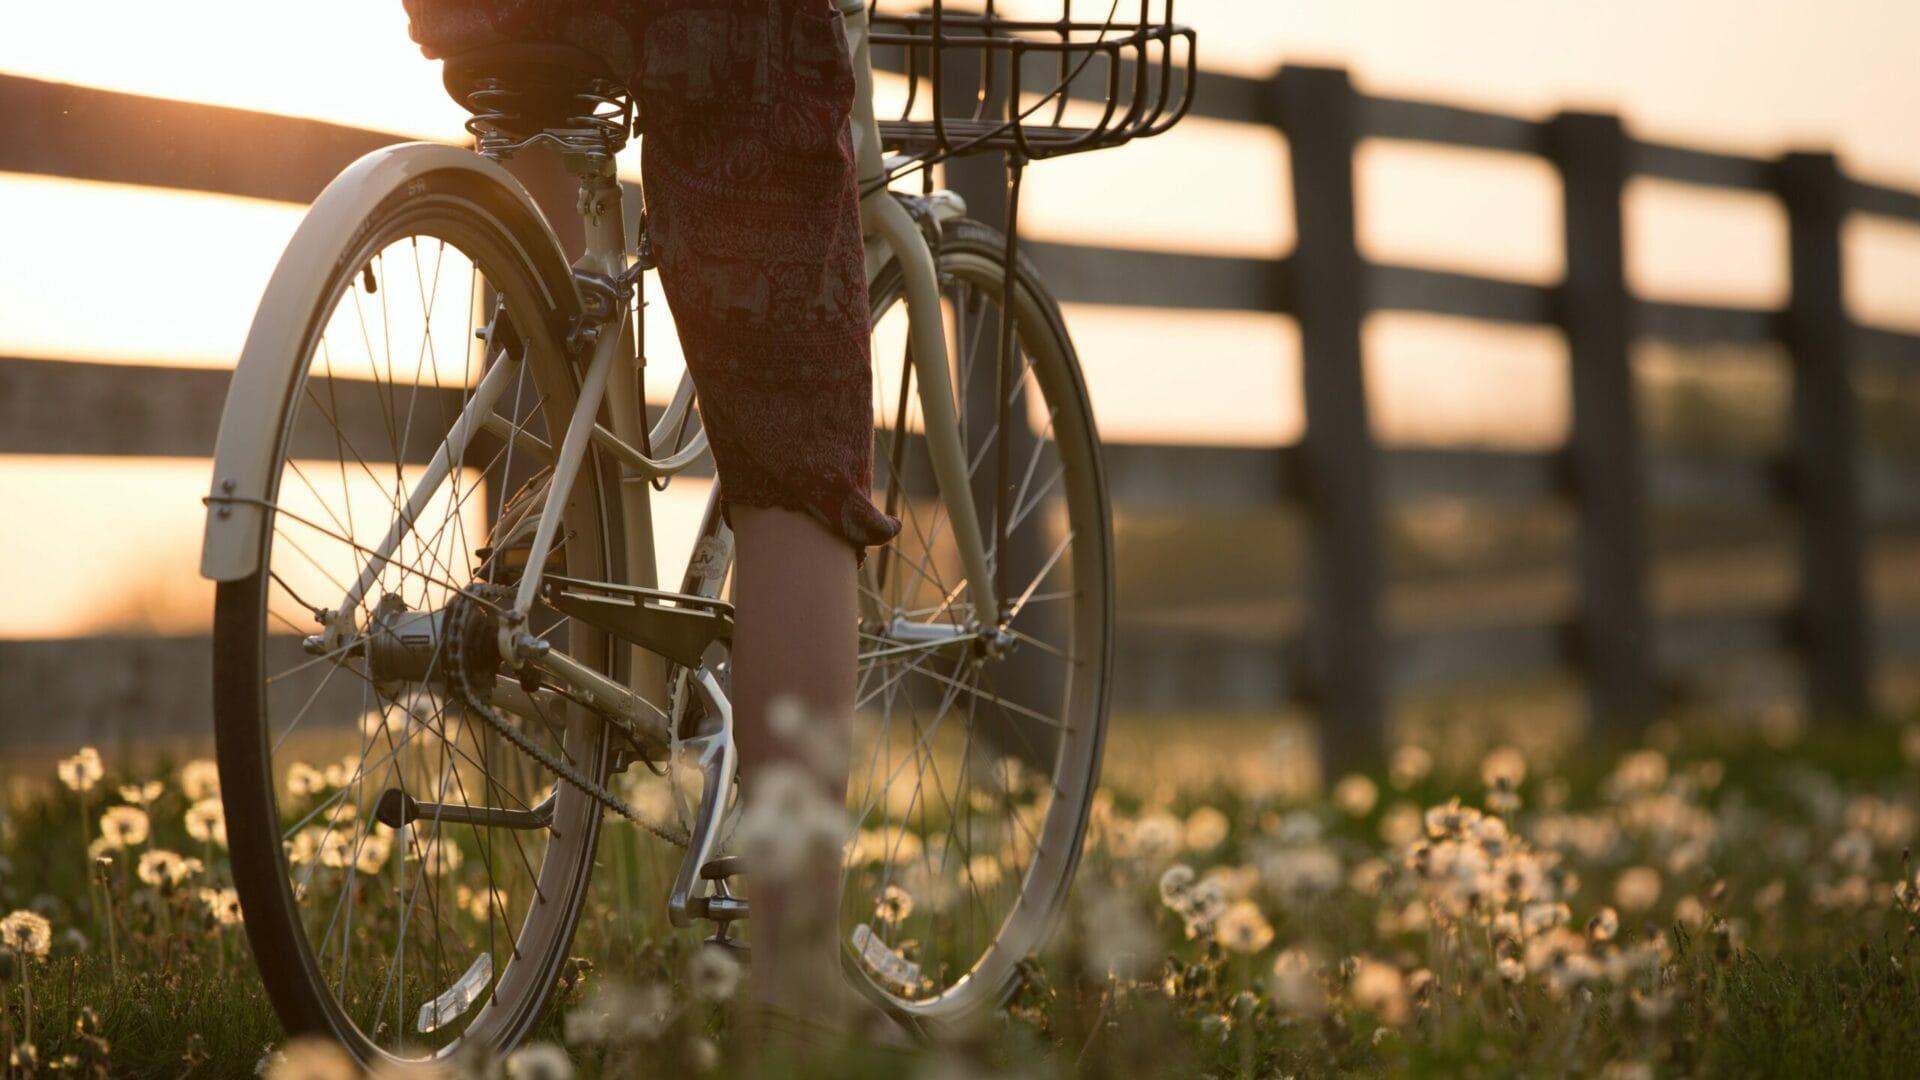 hofgut-apartment-lifestyle-resort-wagrain-erlebenimhofgut-aussenanlage-fahrradverleih